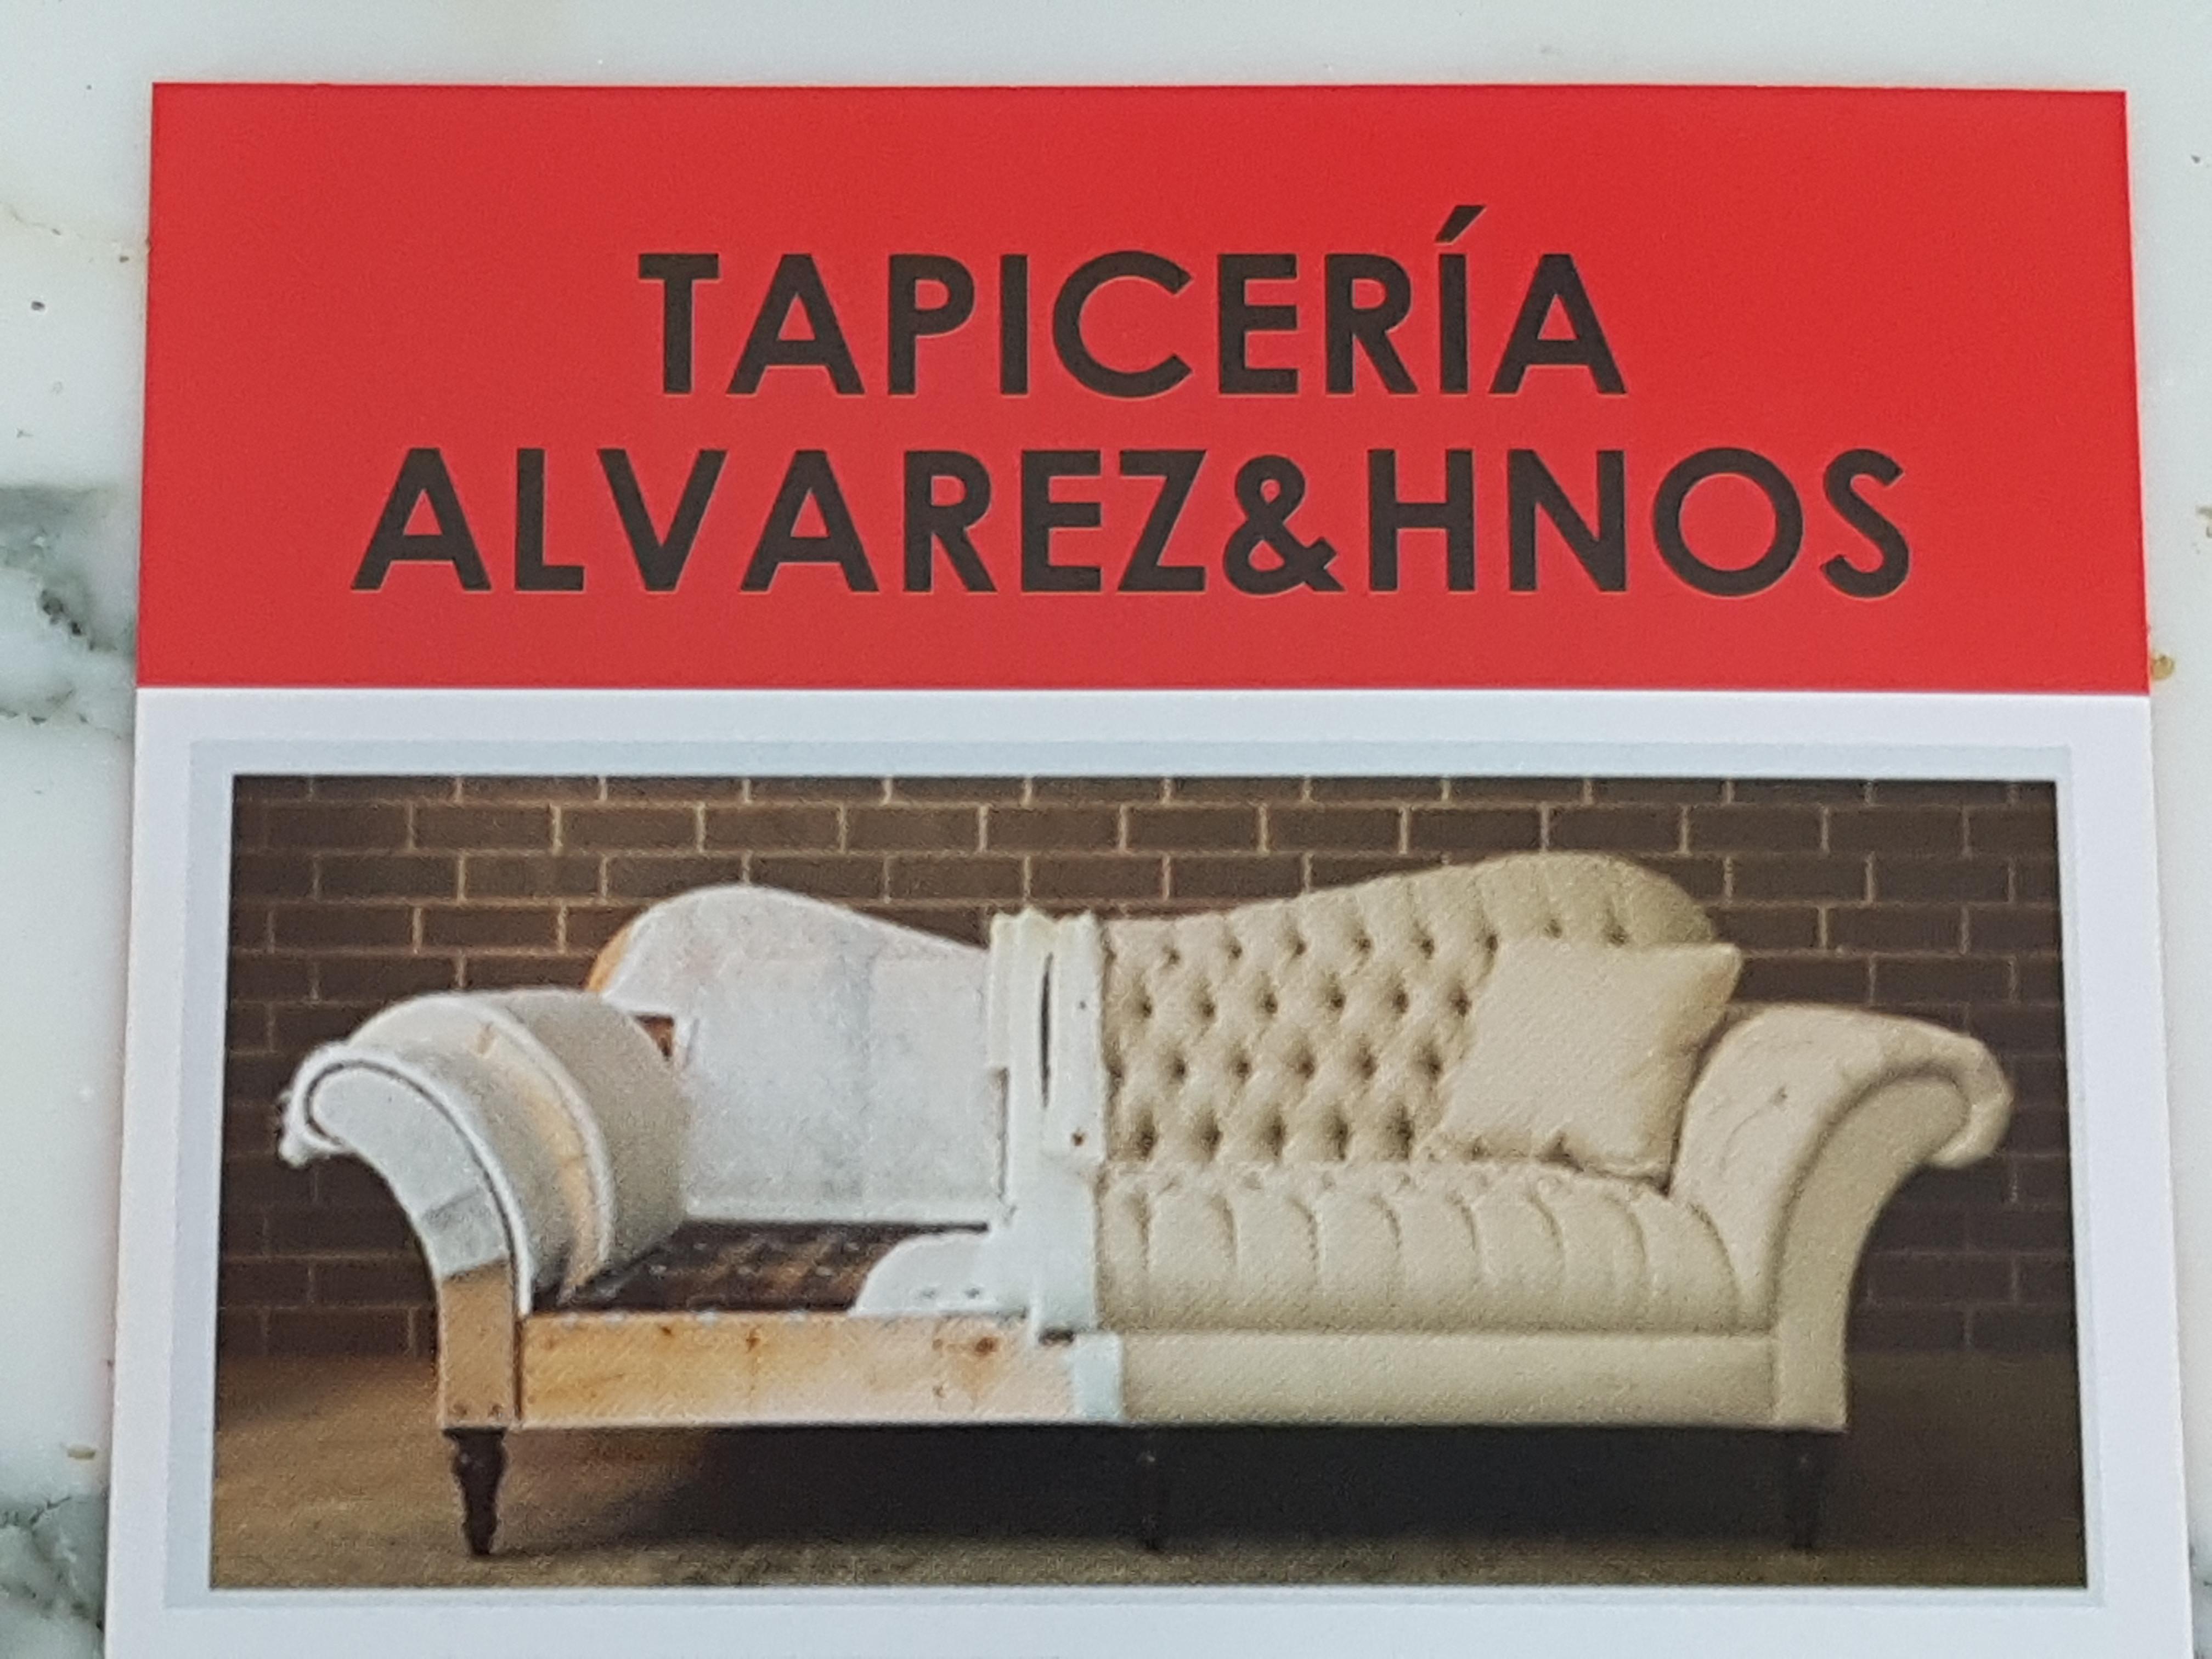 TAPICERIA ALVAREZ HERMANOS